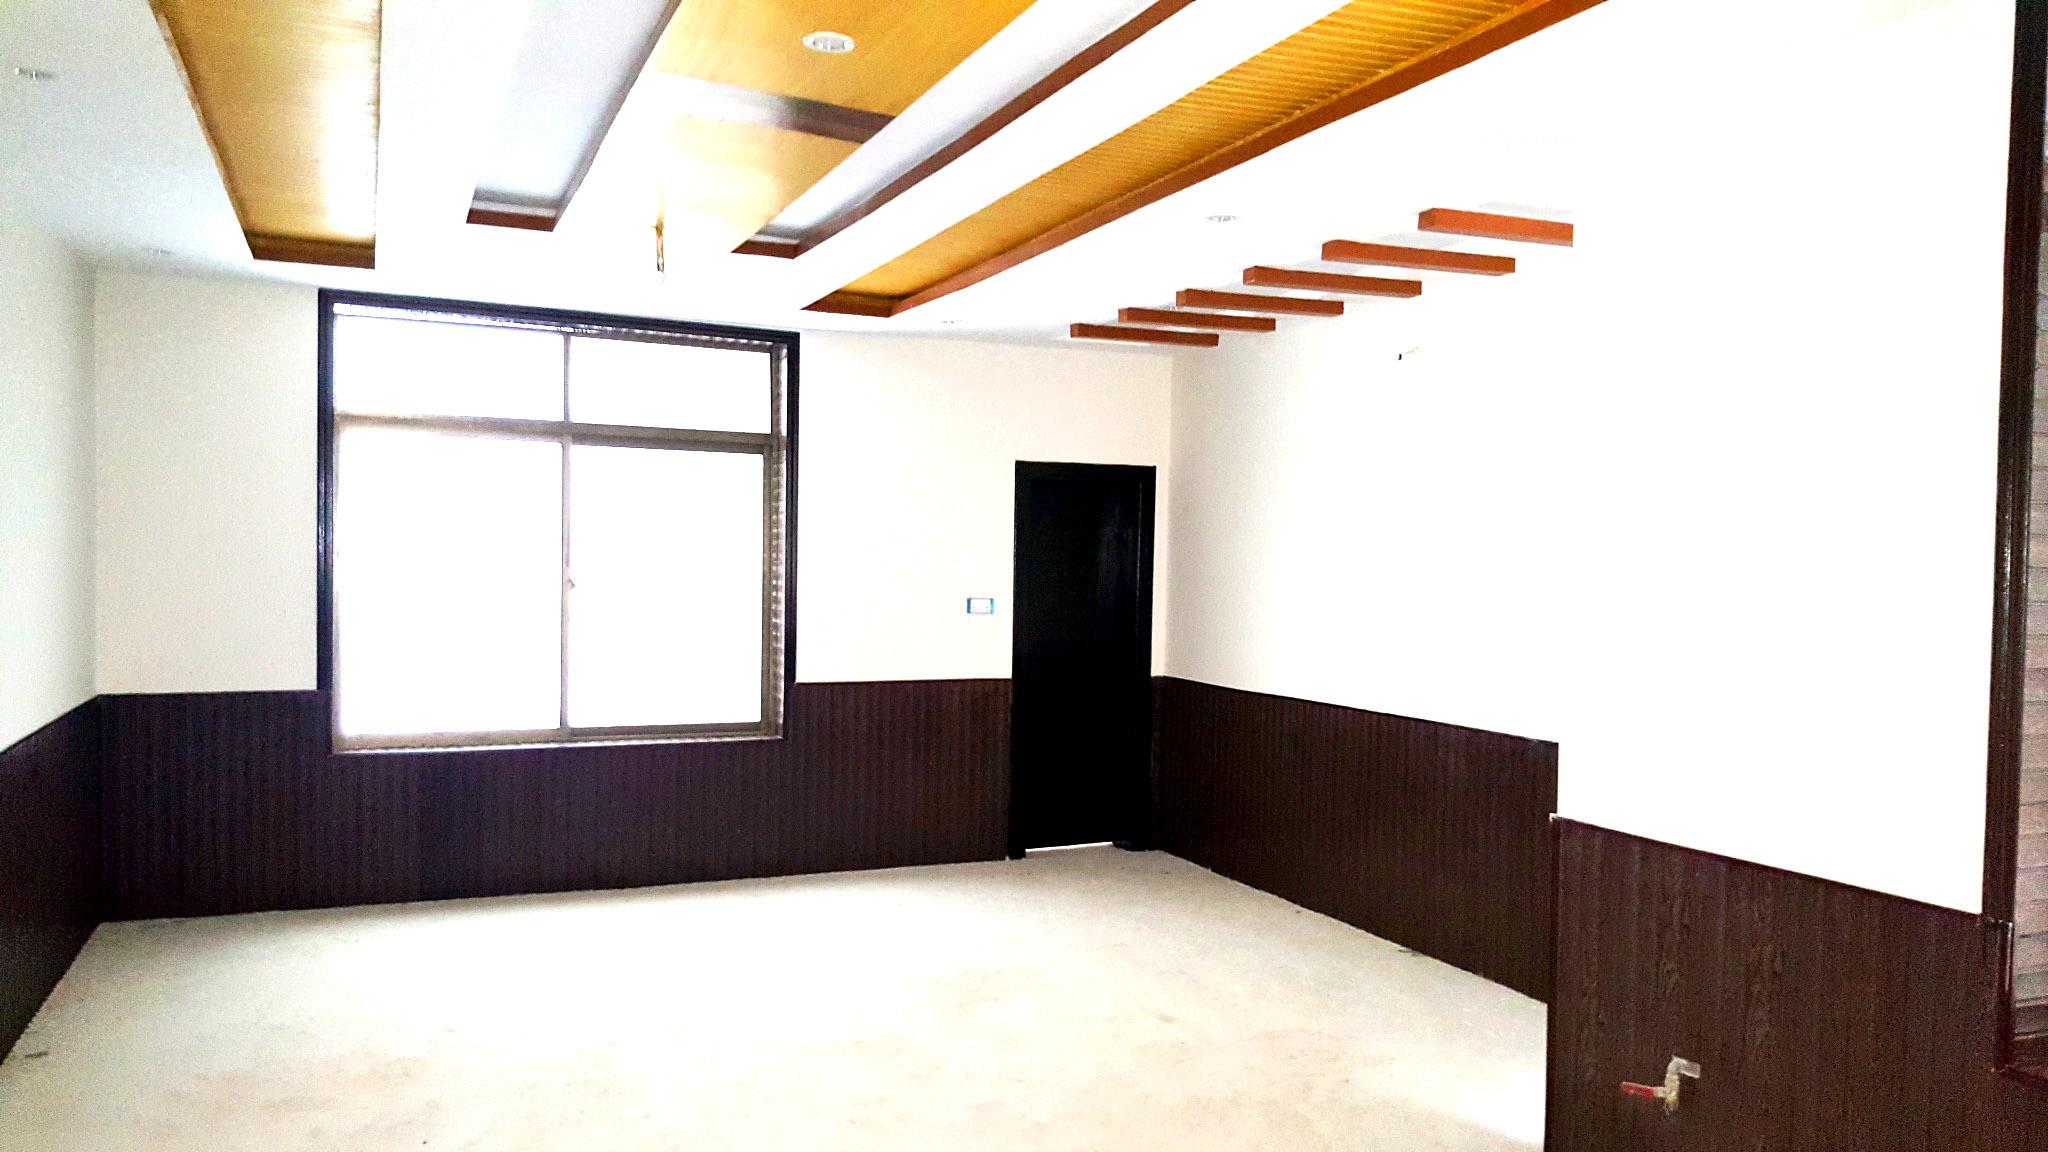 House for rent at Jinnah town Quetta